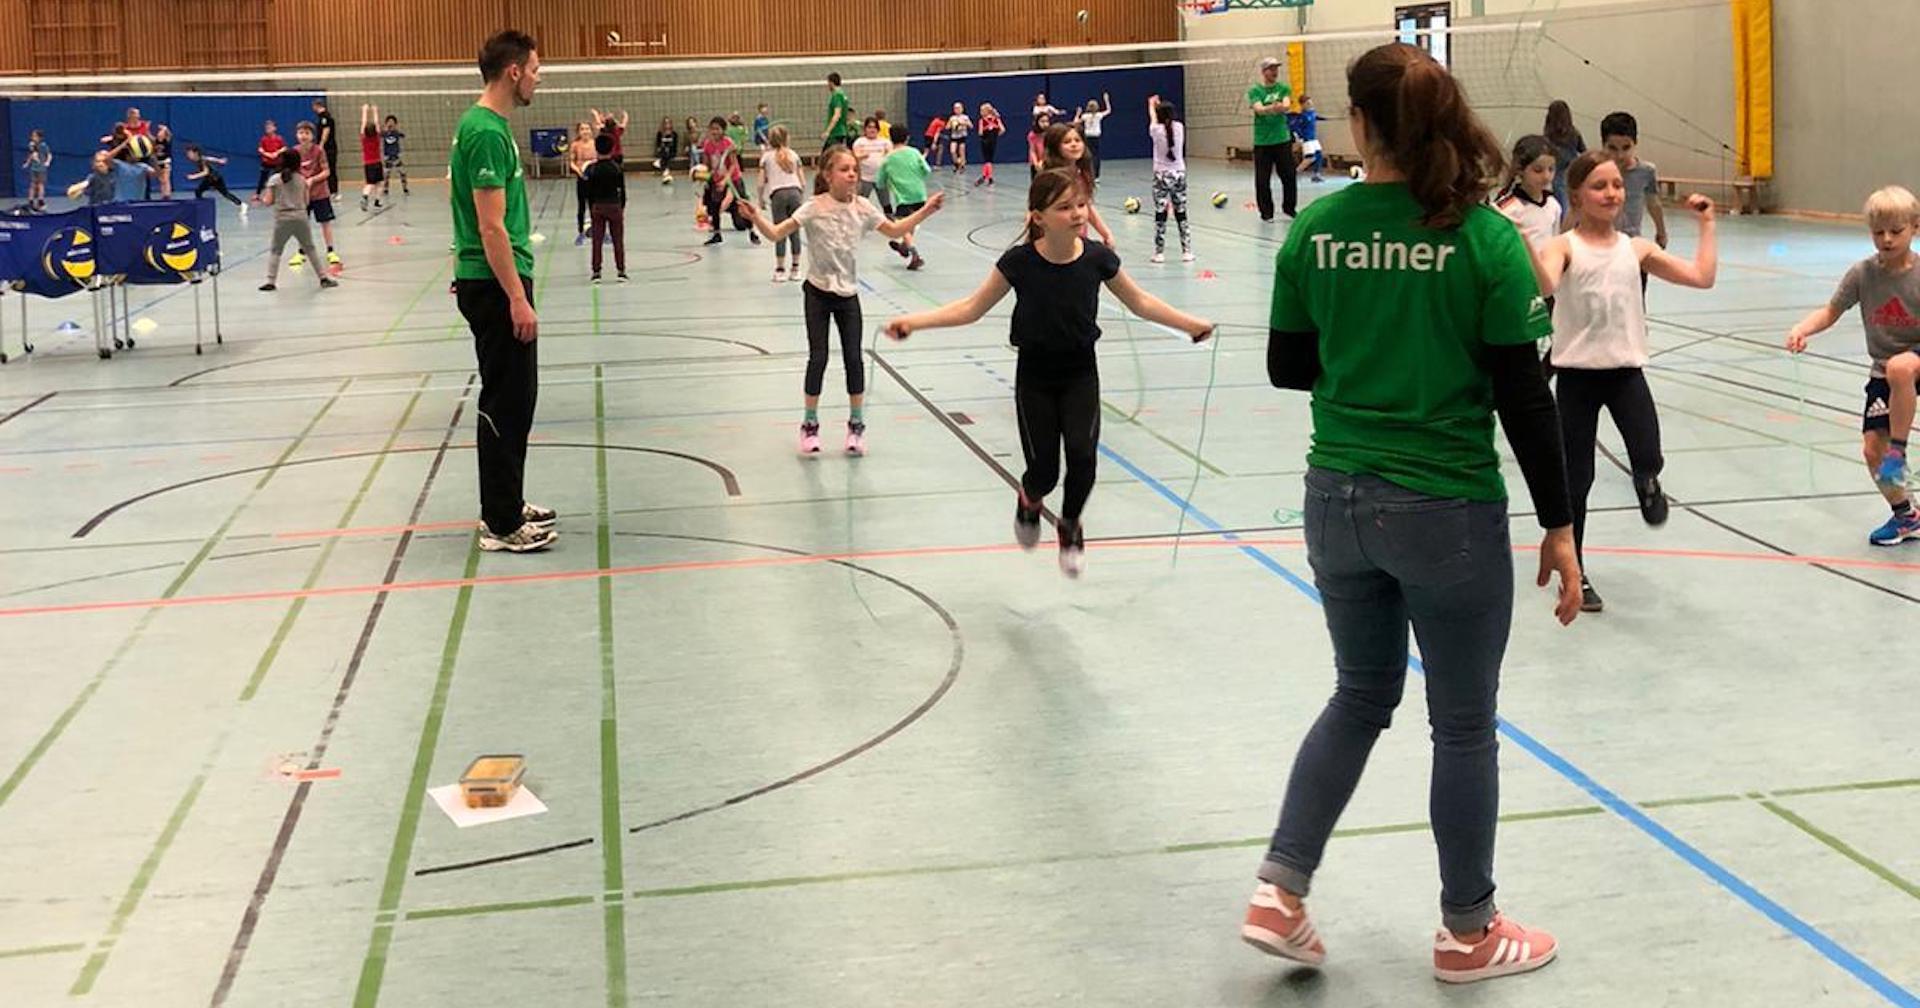 Grundschulaktionstag in Heidelberg